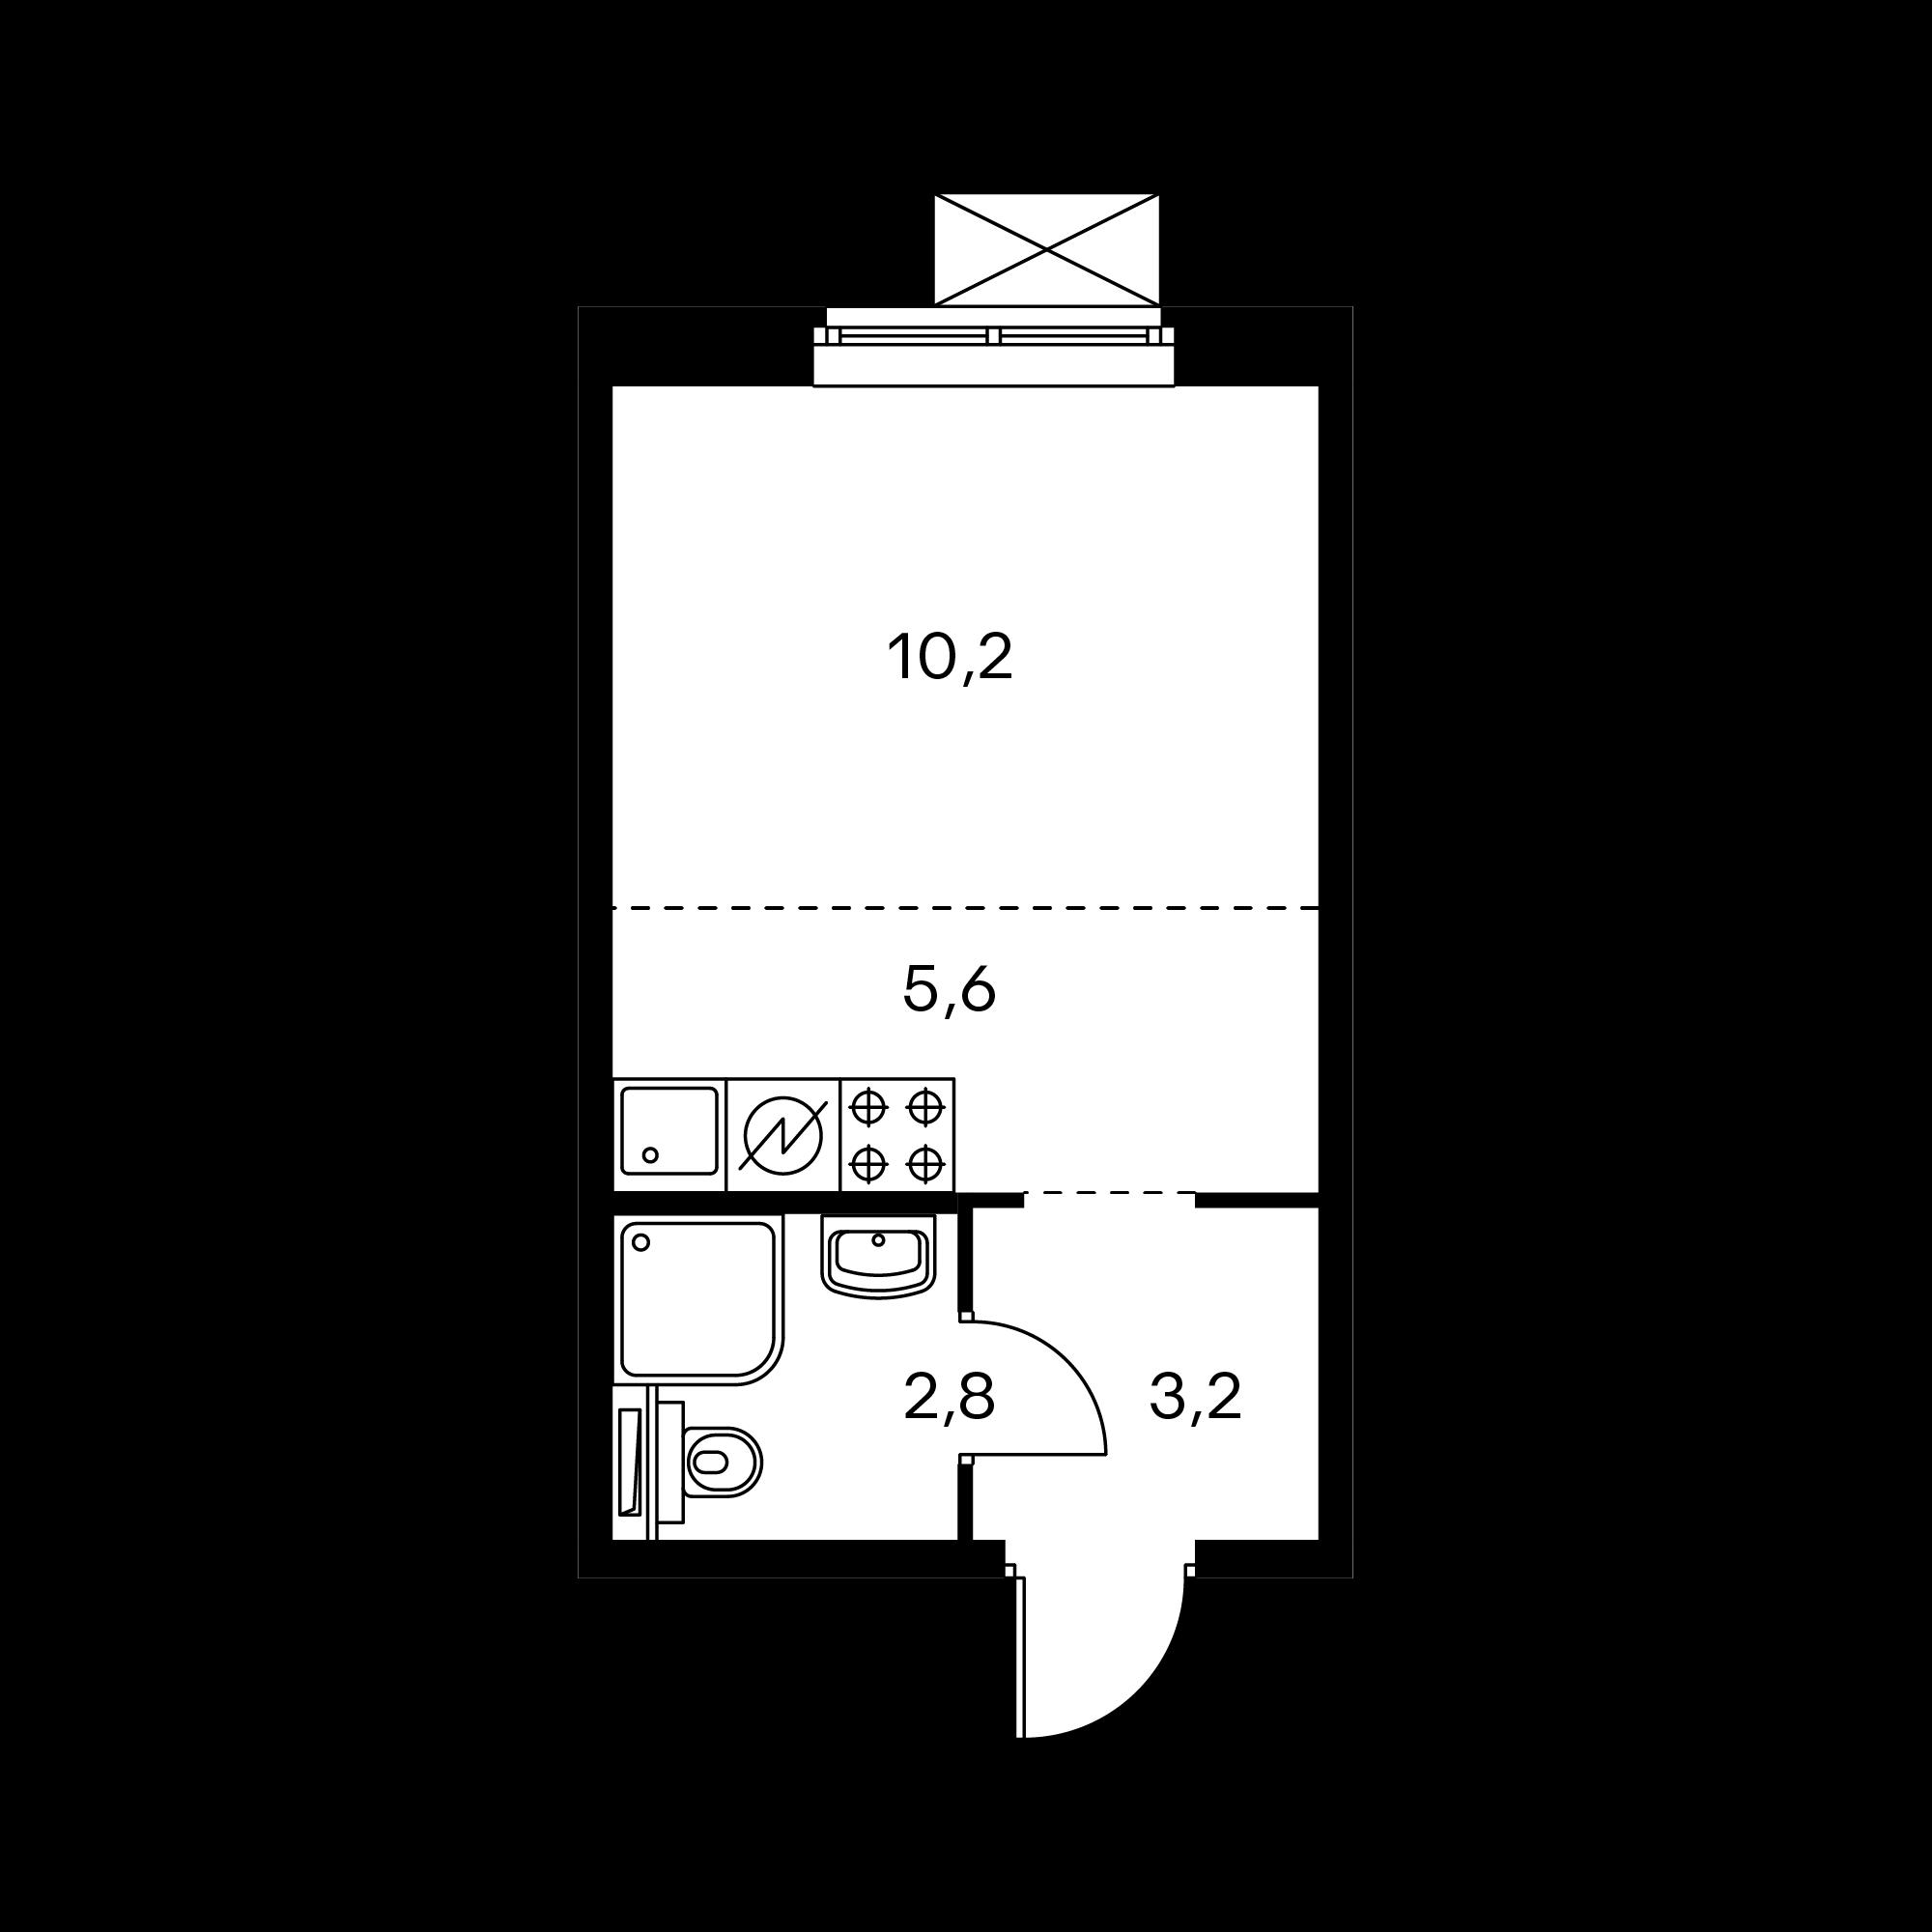 1NS1_3.9-2